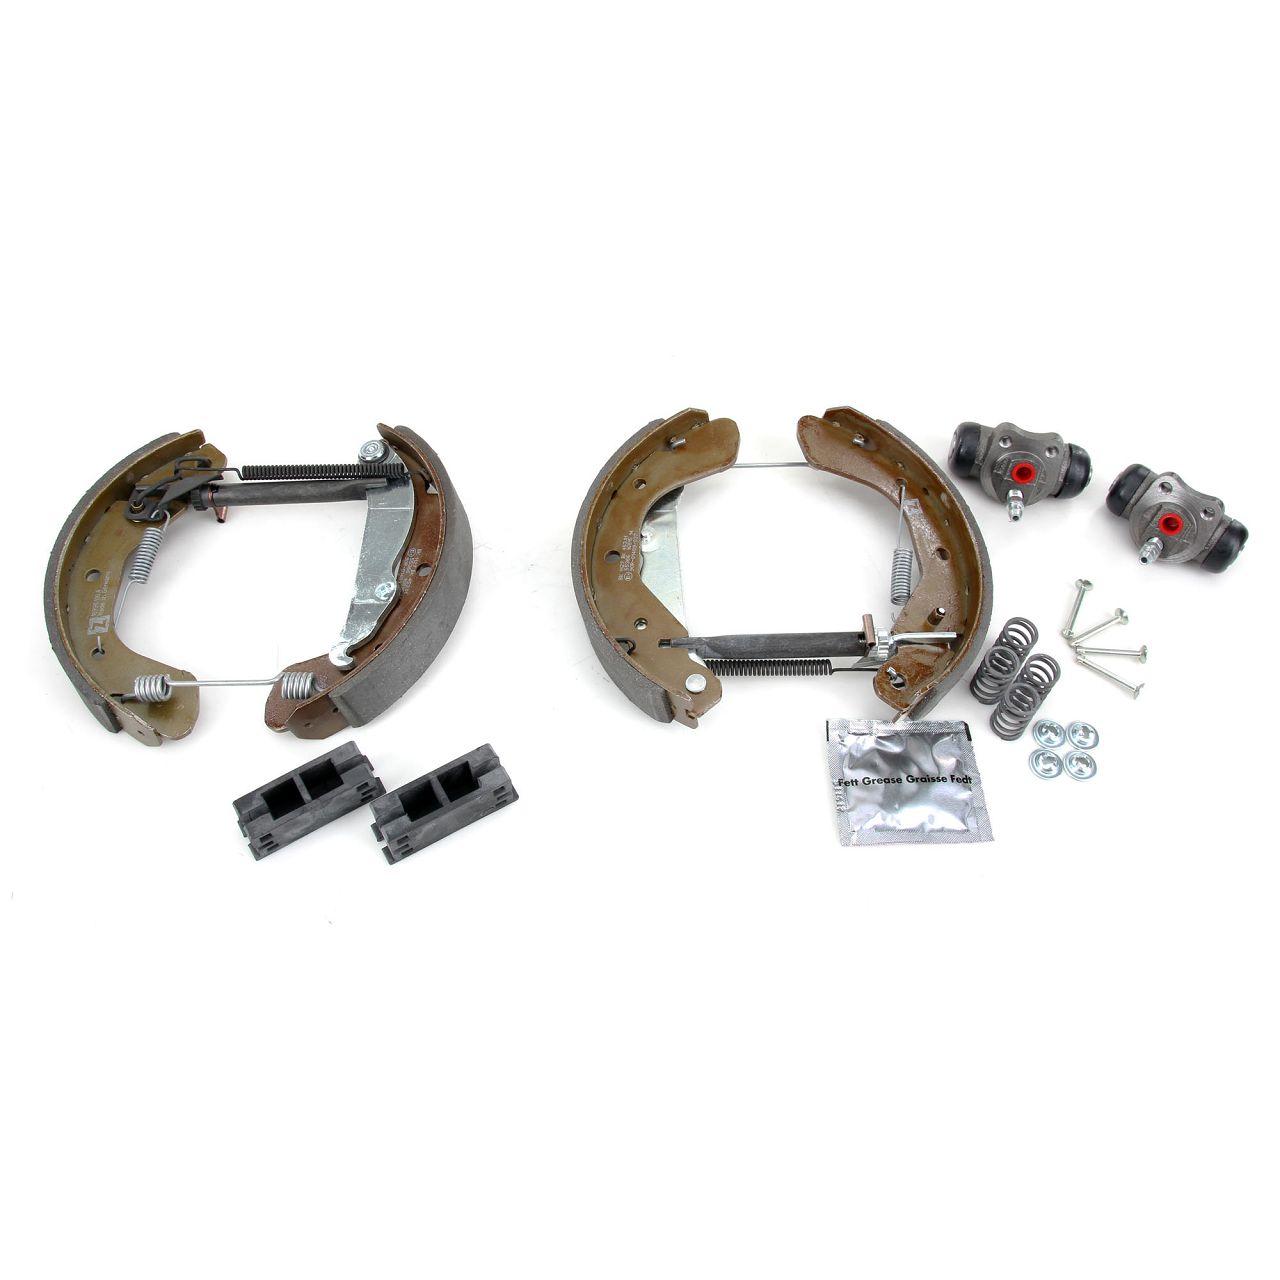 ZIMMERMANN Bremsbacken + Radbremszylinder Satz OPEL Astra F / CC Corsa B Tigra A